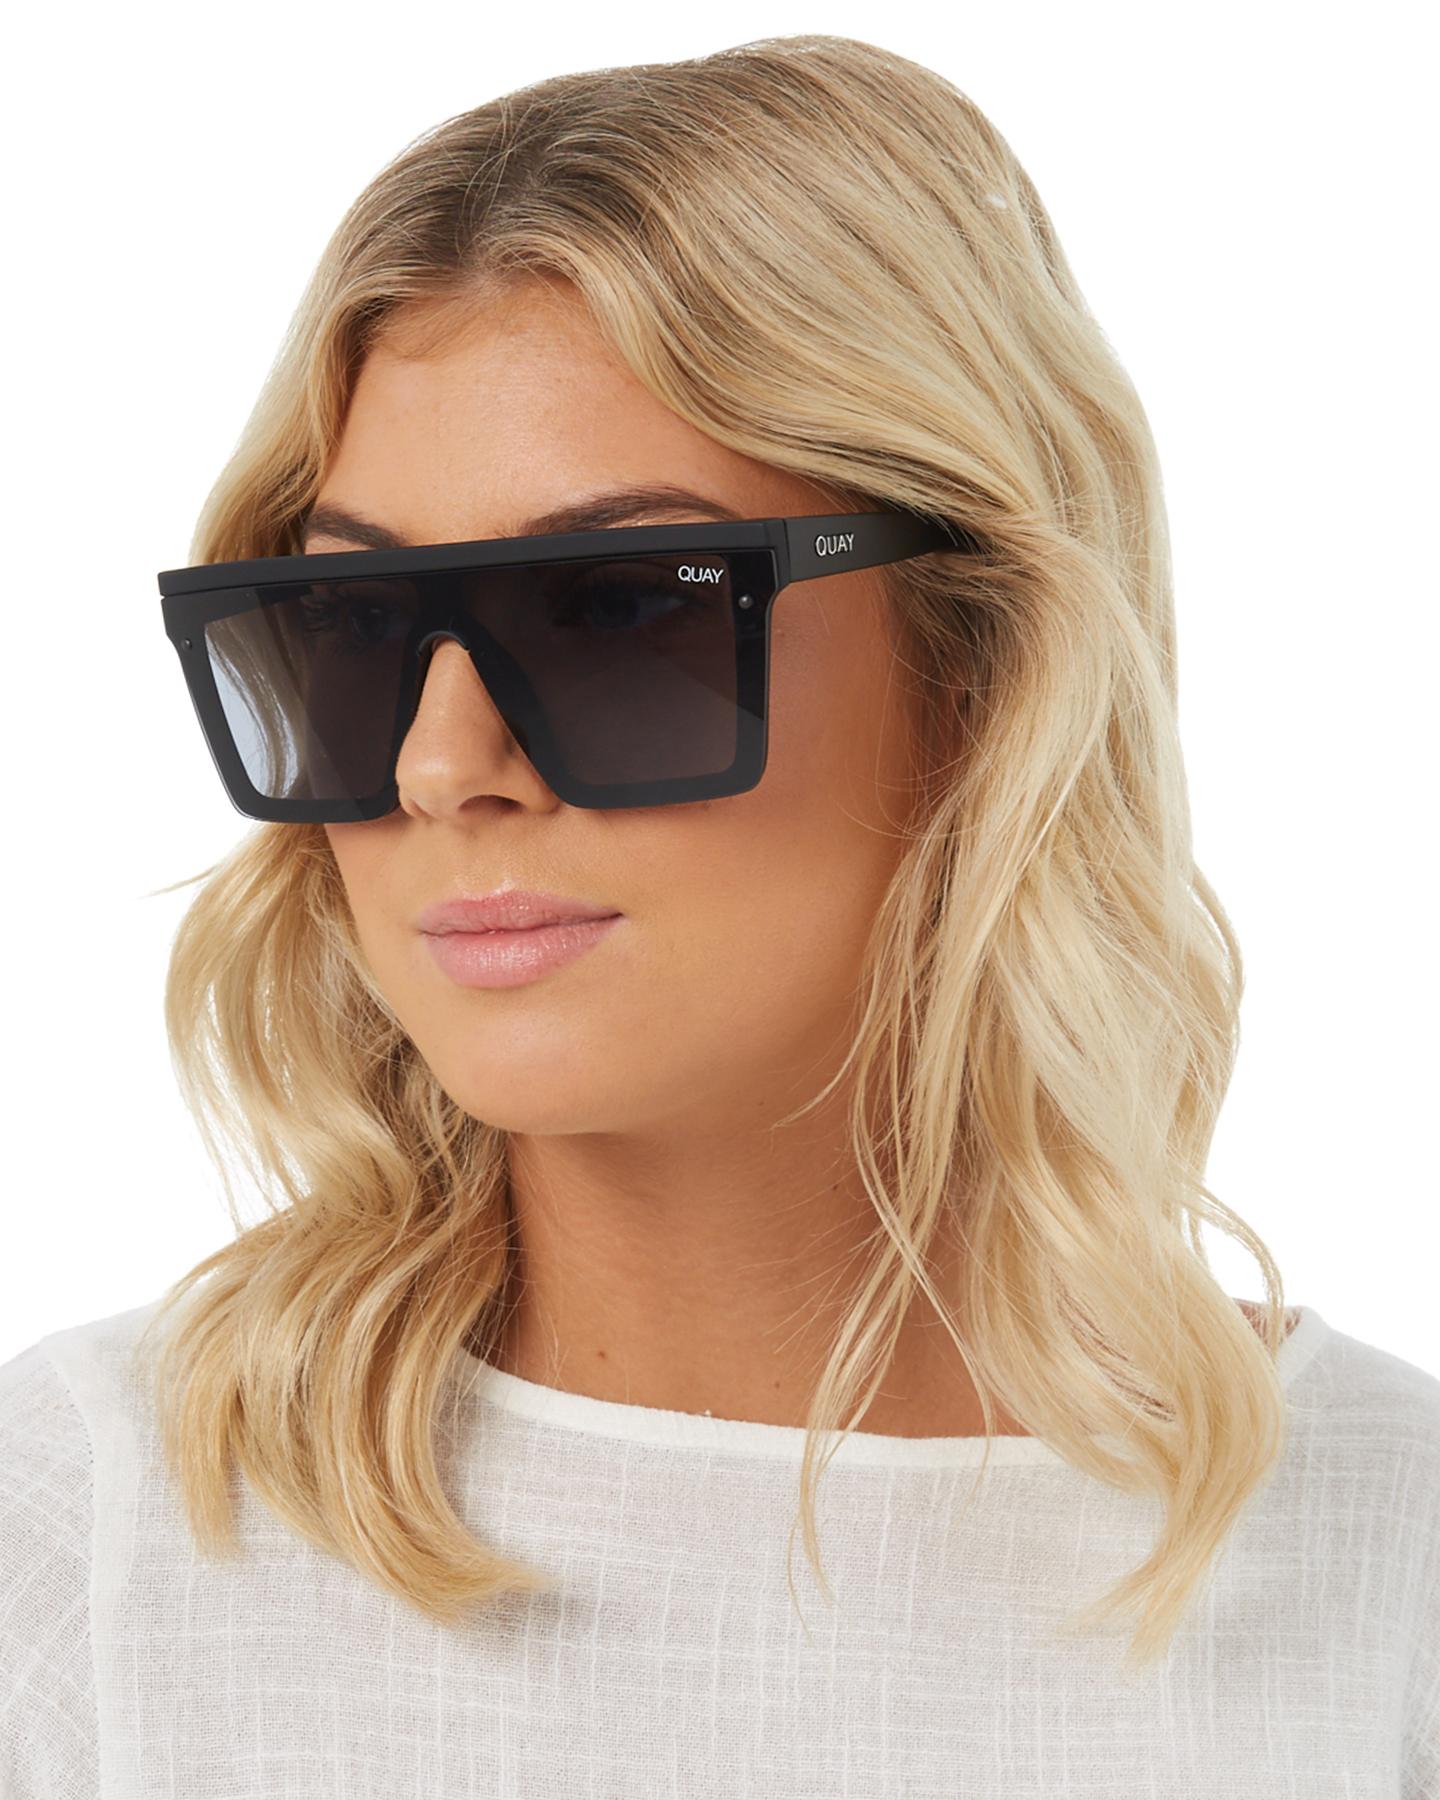 New-Quay-Eyewear-Women-039-s-Hindsight-Sunglasses-Stainless-Steel-Glass-Pink thumbnail 20